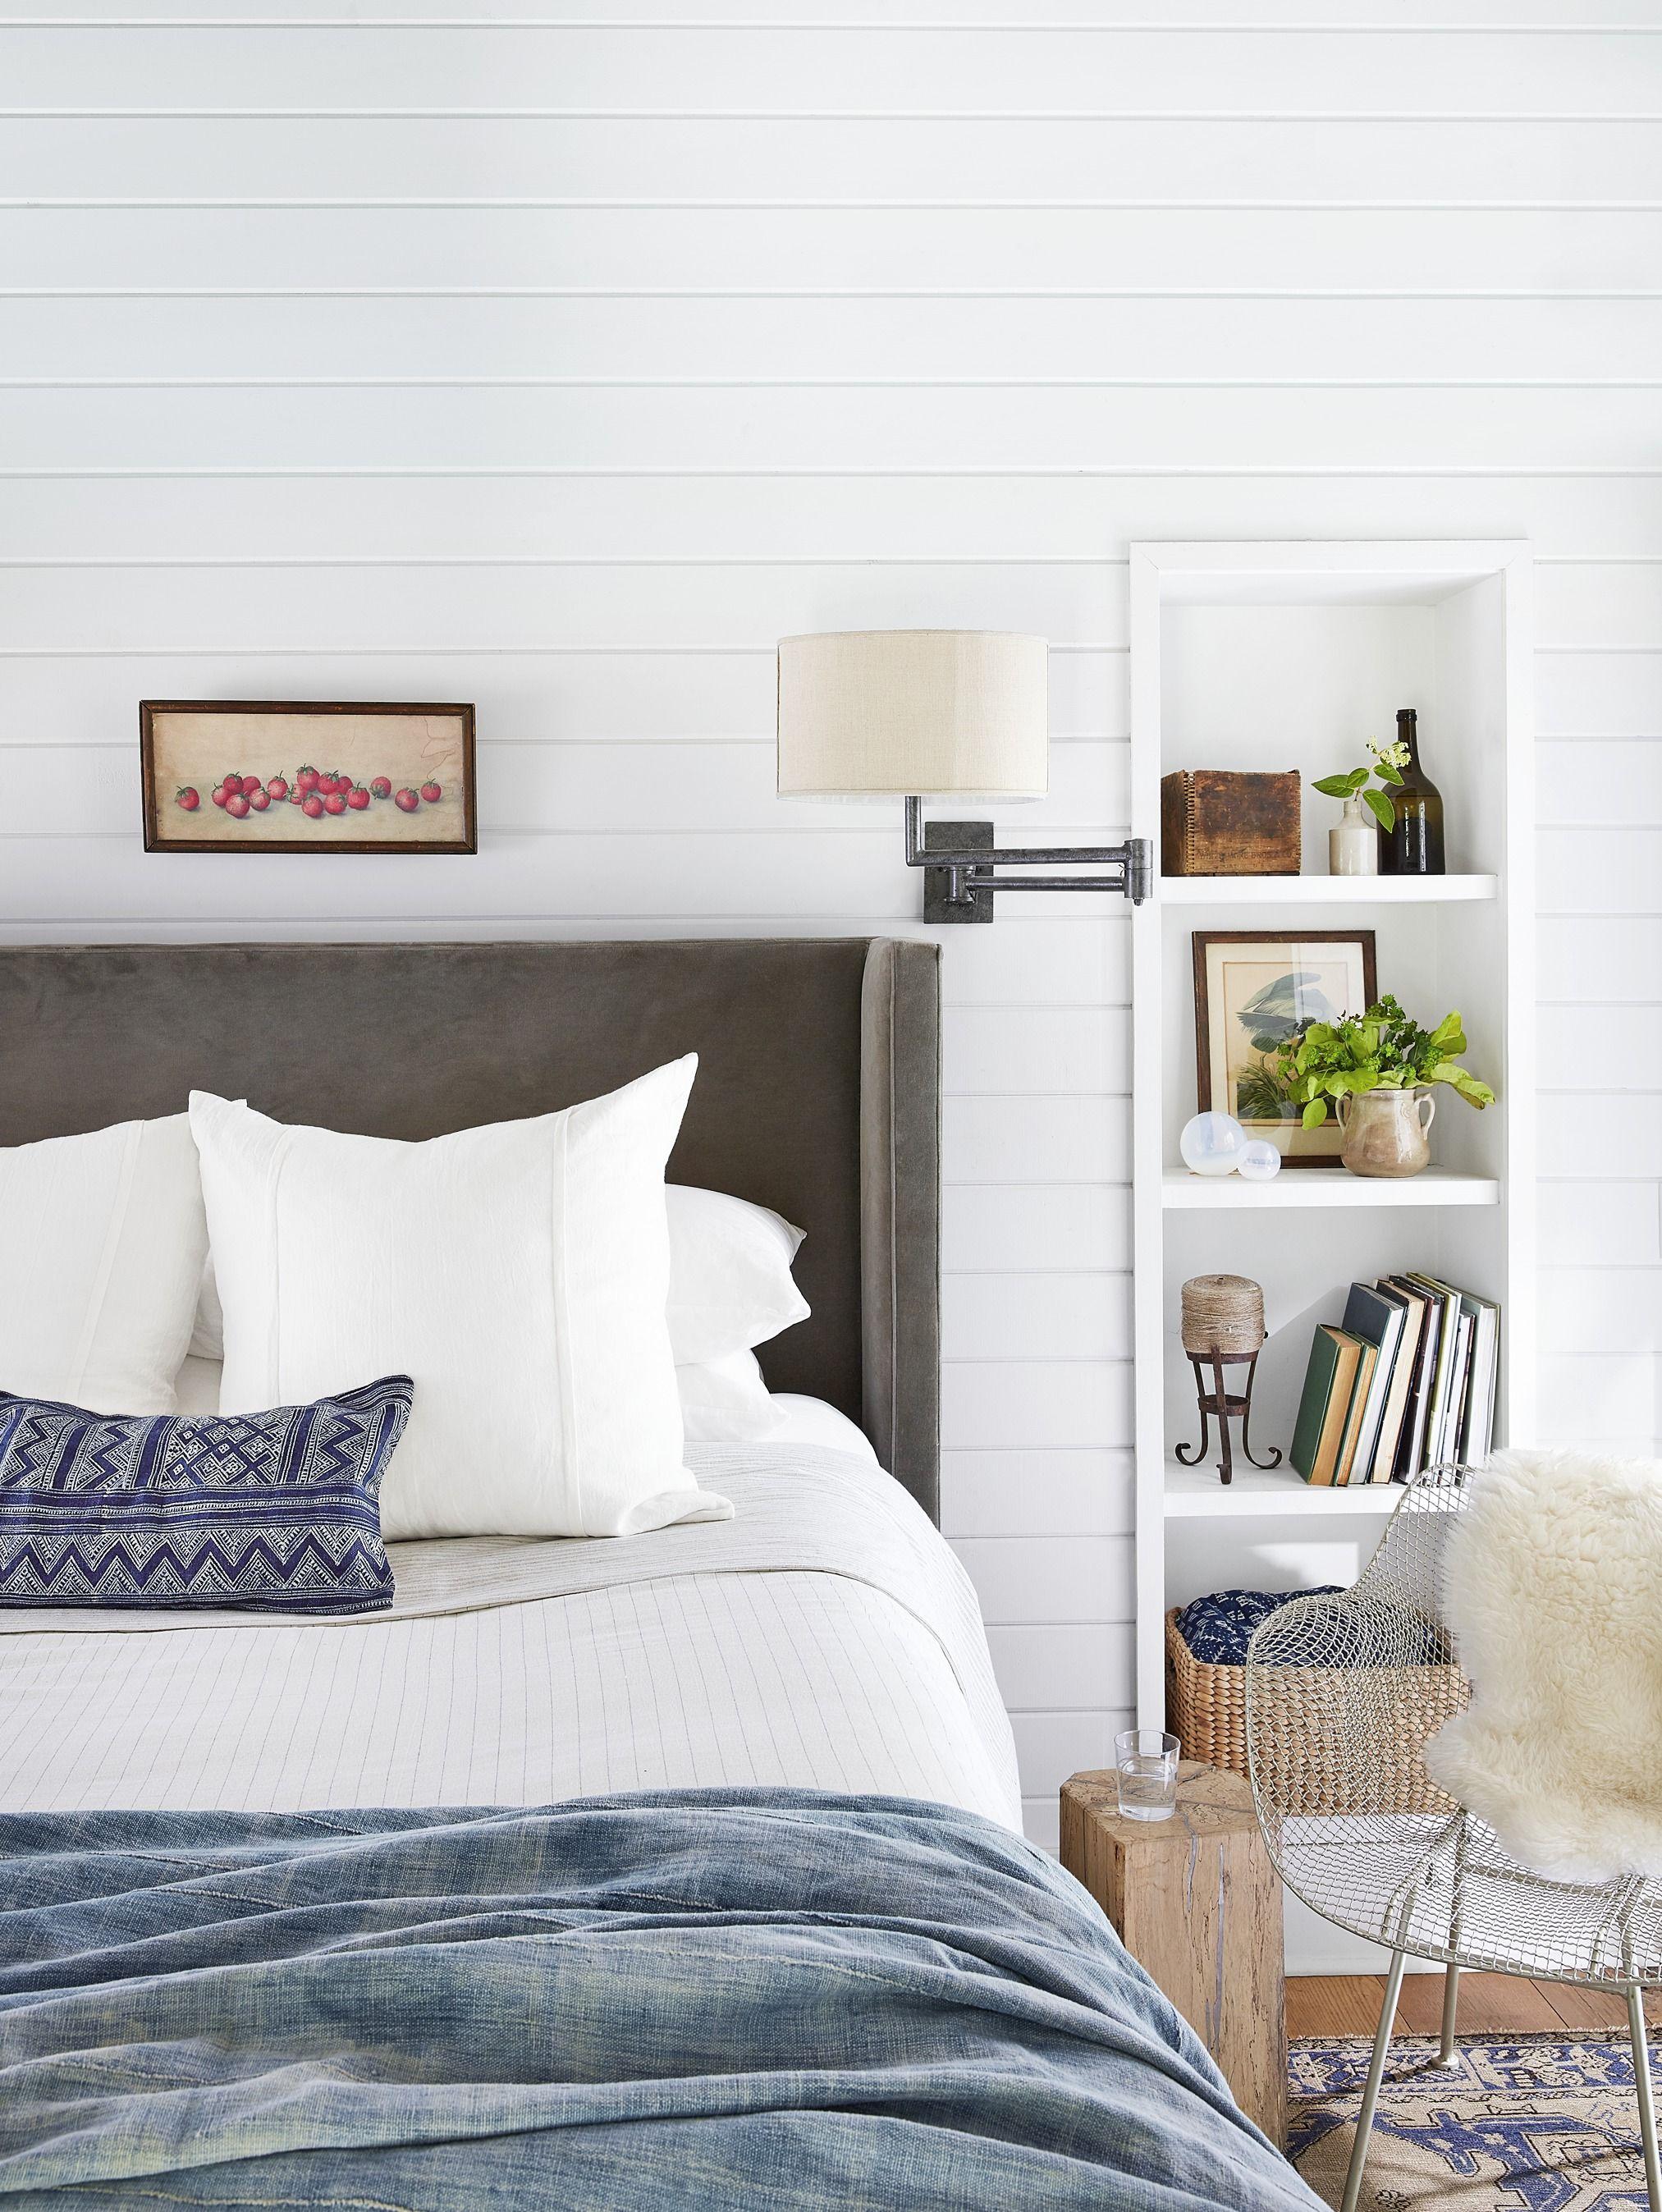 12+ Bedroom Decorating Ideas in 12 - Designs for Beautiful Bedrooms